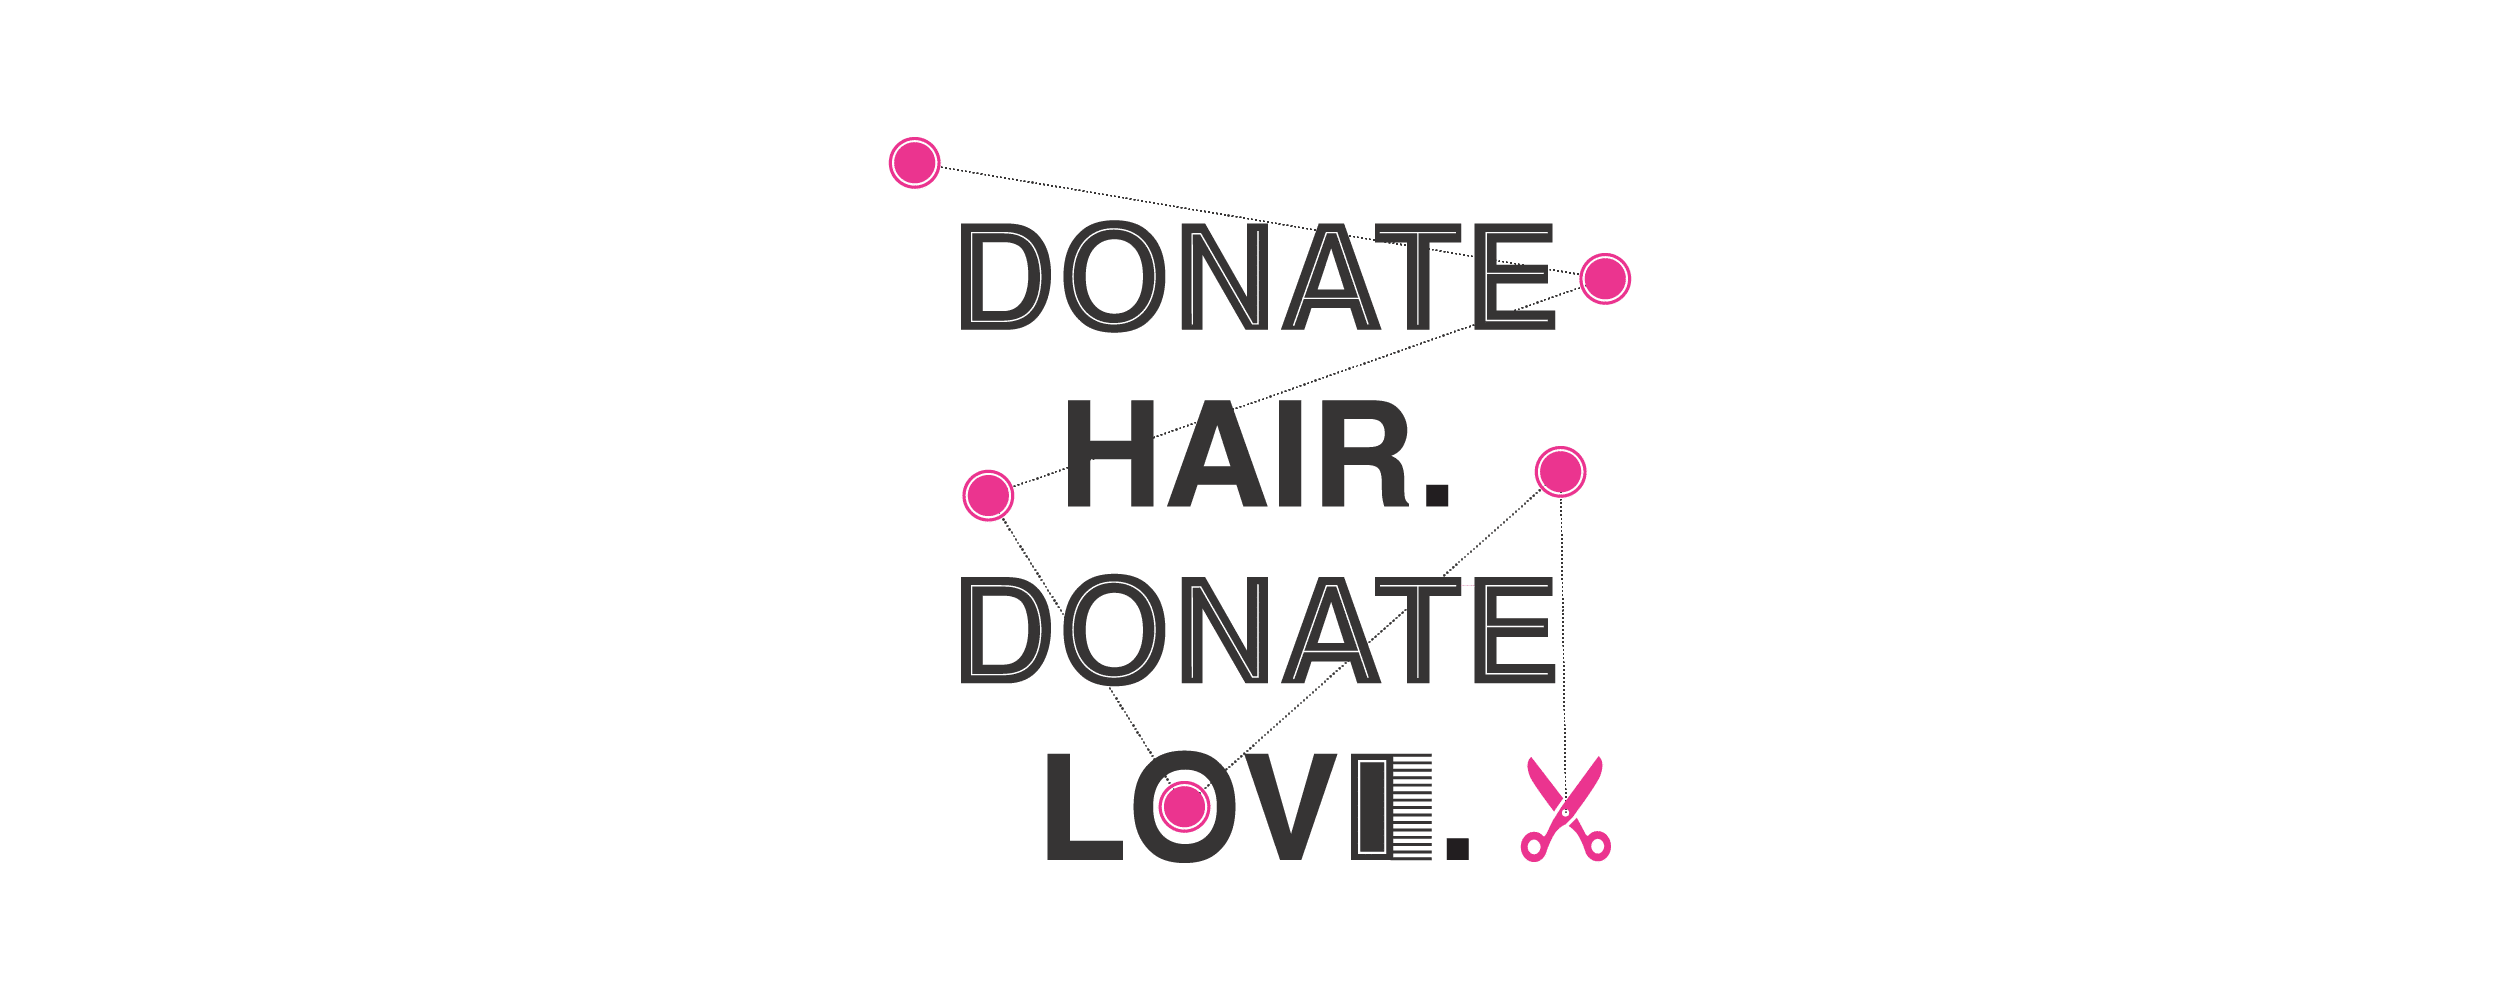 donate hair-01